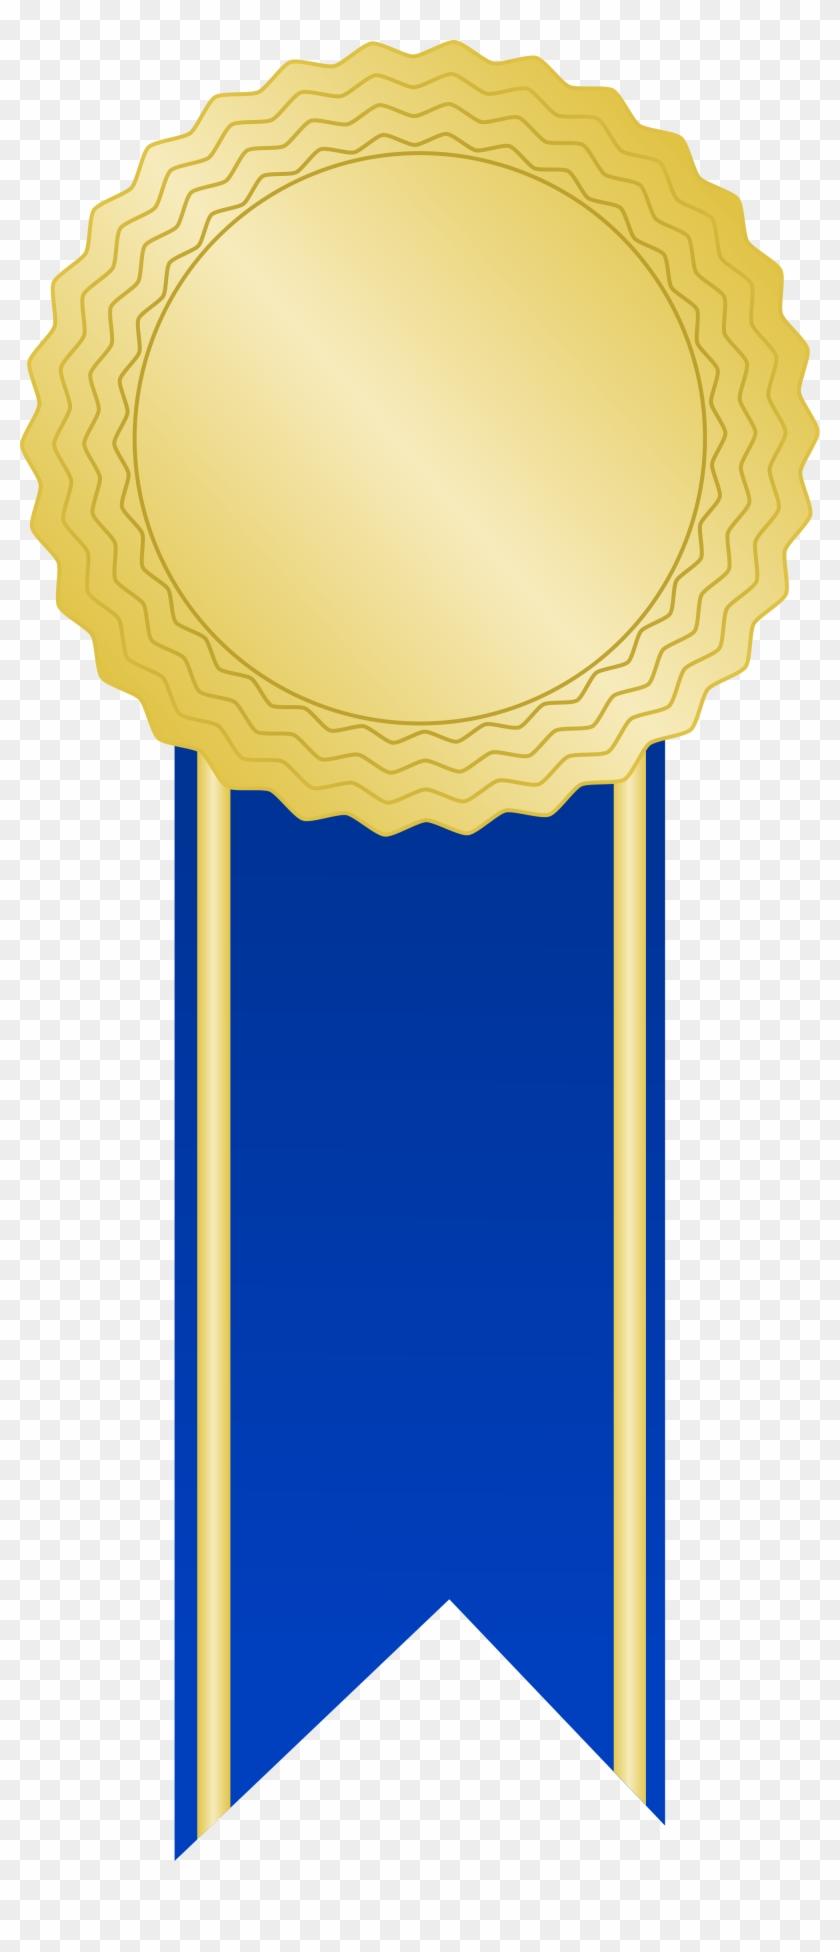 Open - Blue Award Ribbon Png #187461